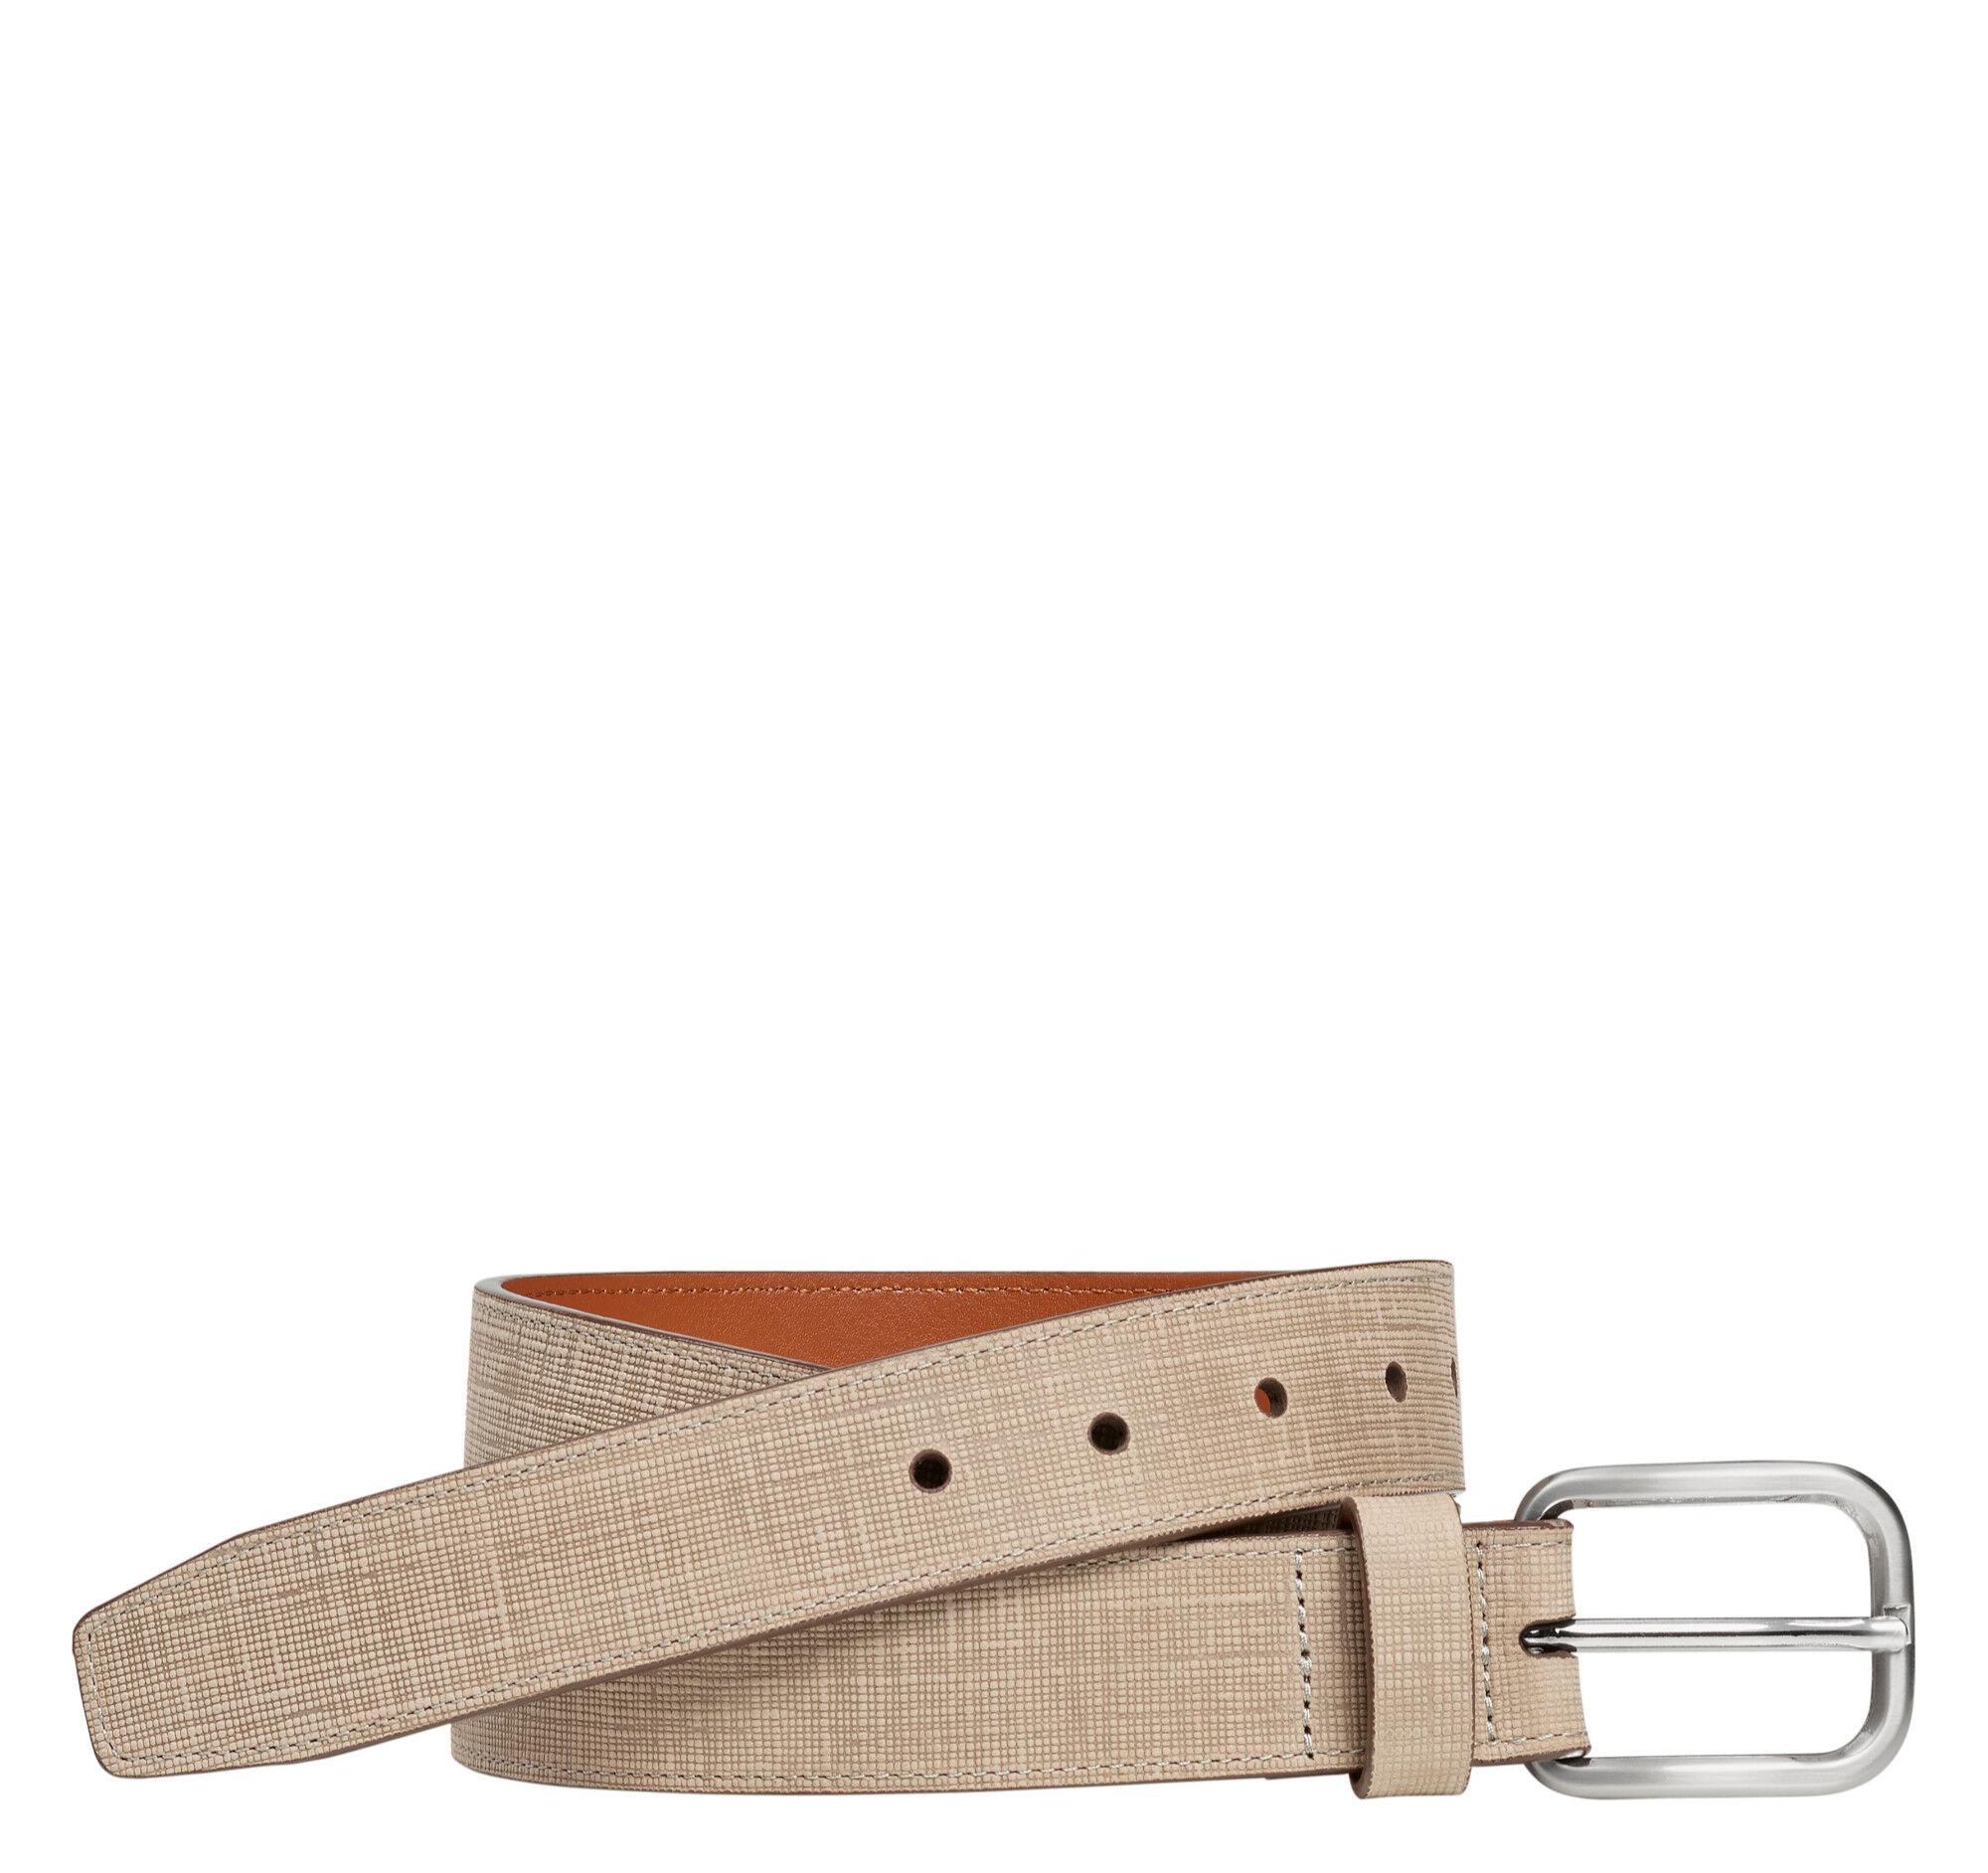 Johnston & Murphy Men's Cross Hatch Embossed Belt - Camel - Size 36